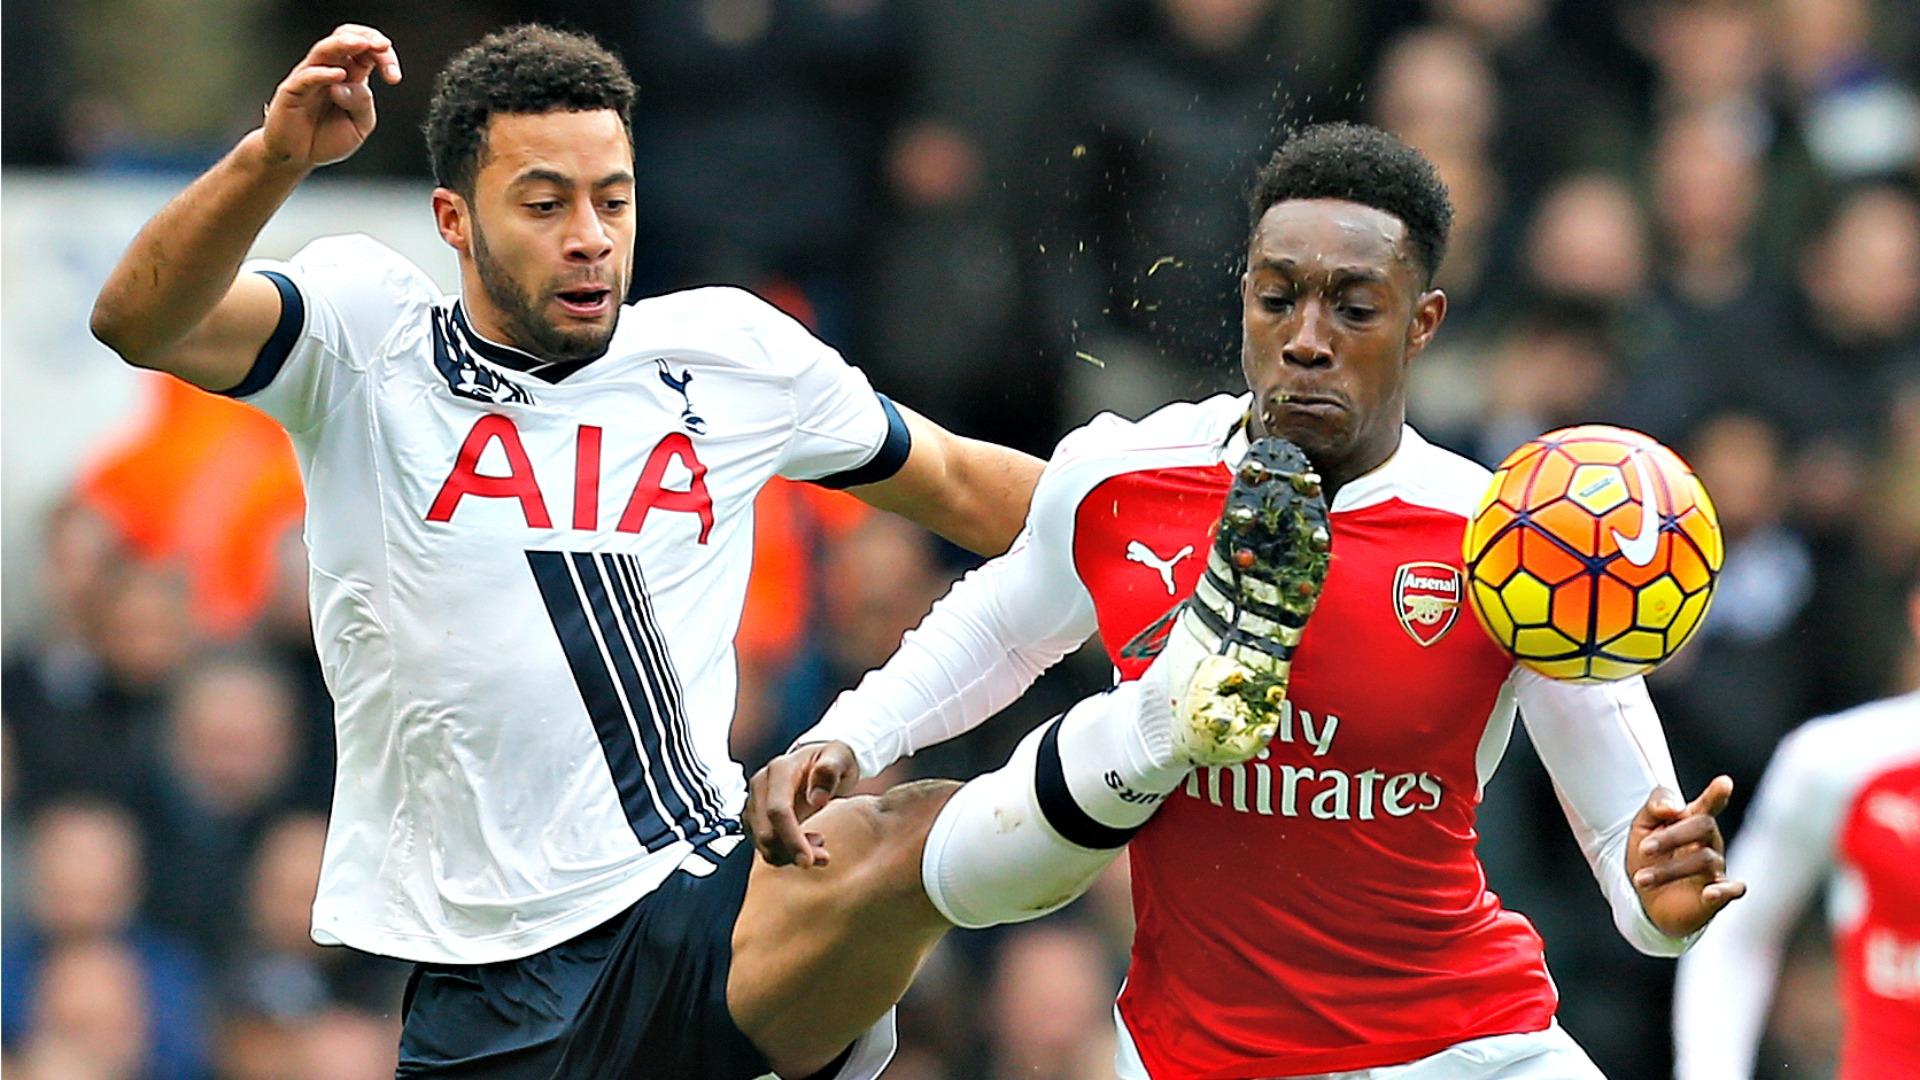 Dembele Welbeck Tottenham Arsenal 05032015